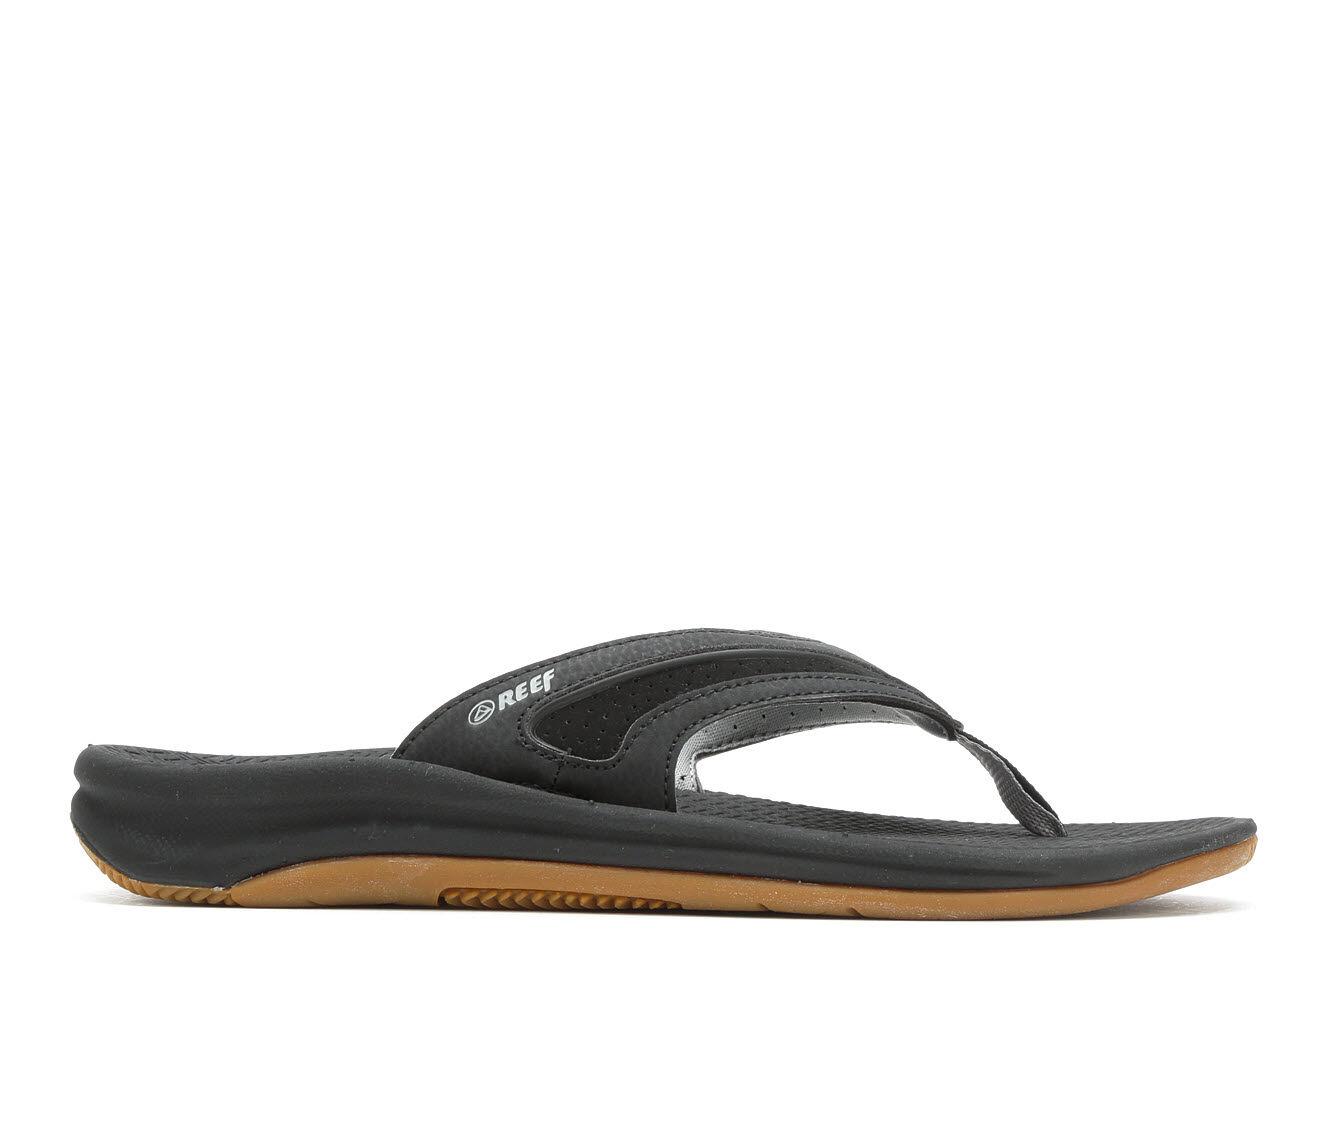 Reef Sandals   Shoe Carnival